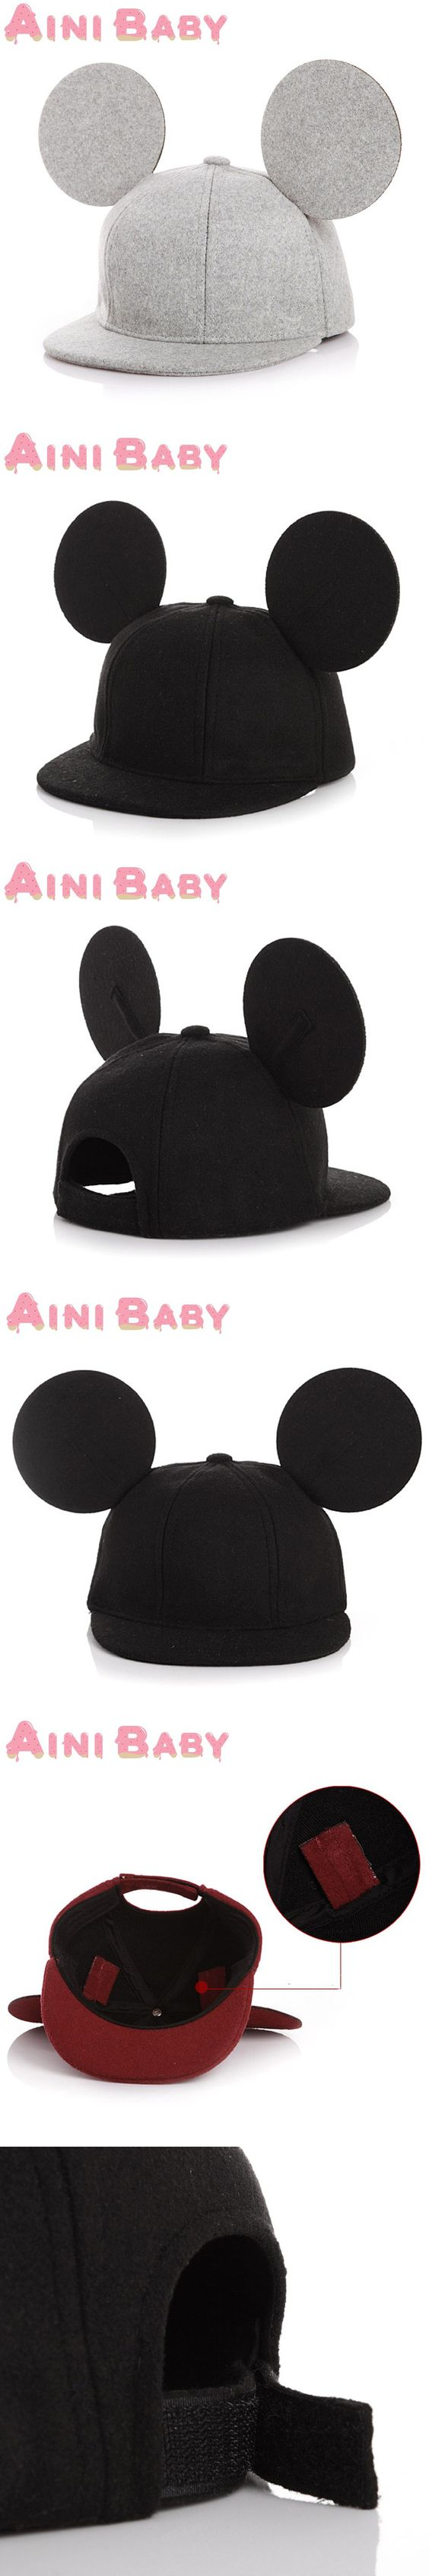 Lovely Ear Child Snapback Hat For Children Cap Hip Hop Hat For Baby Hat Hip-Hop Cap Boy Girls Baseball Cap Bone Free Shipping $6.89